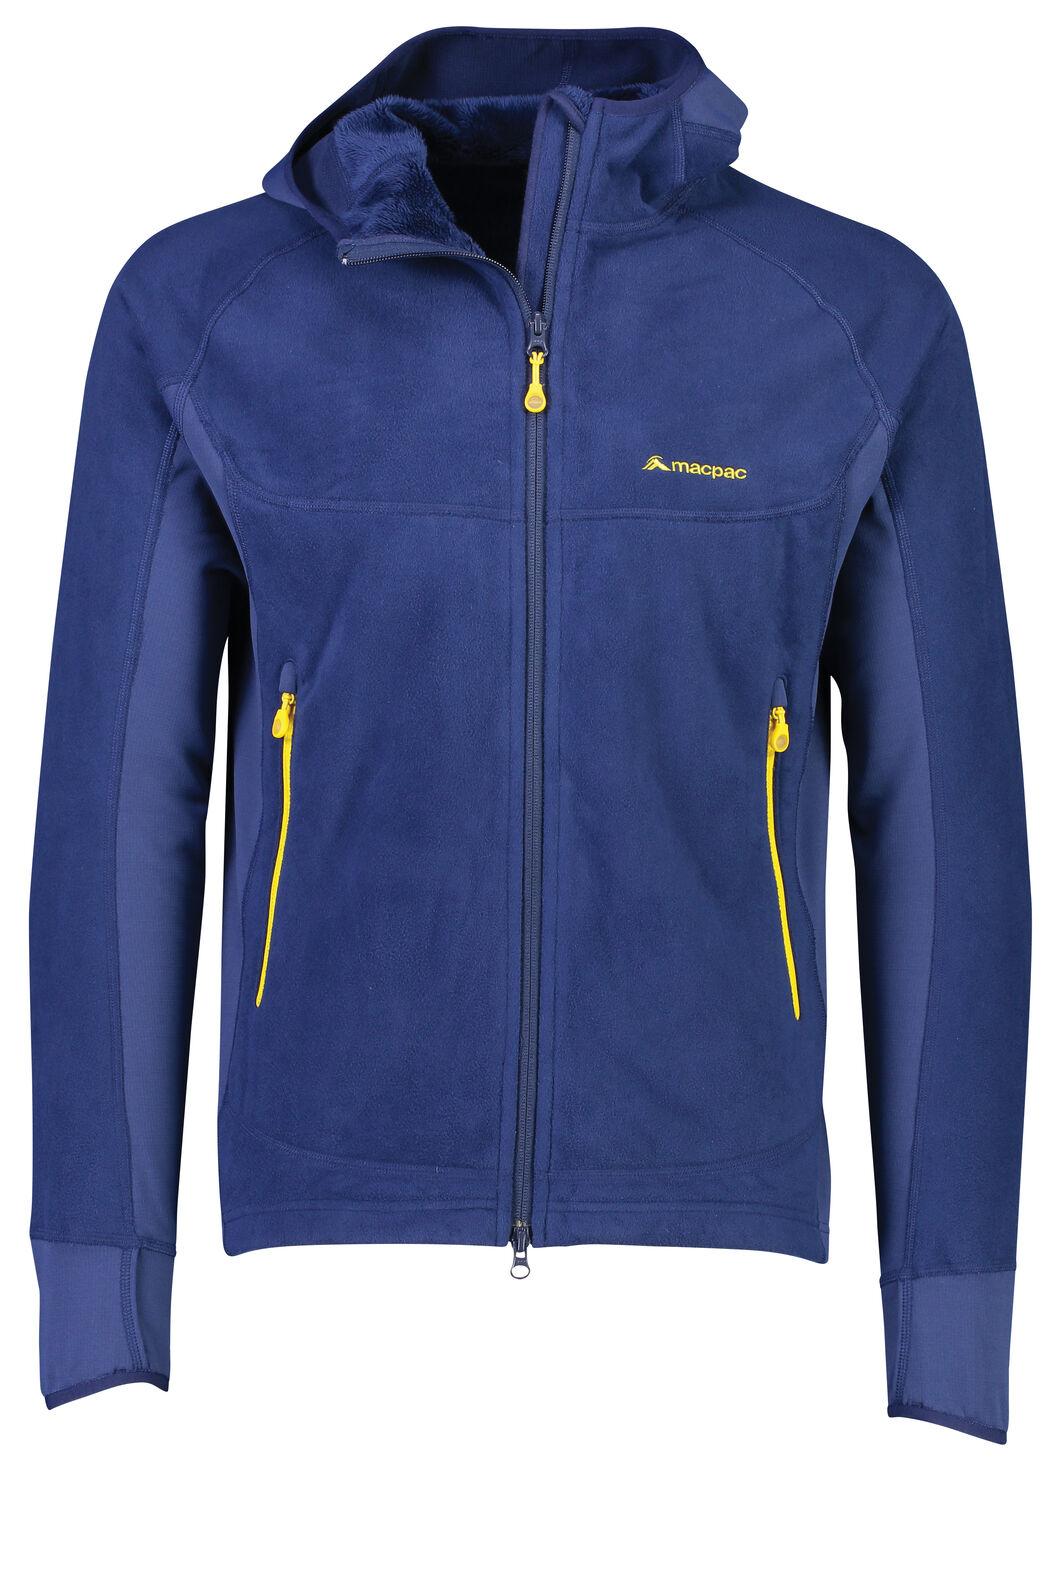 Mountain Hooded Pontetorto® Fleece Jacket - Men's, Medieval/Lemon Curry, hi-res